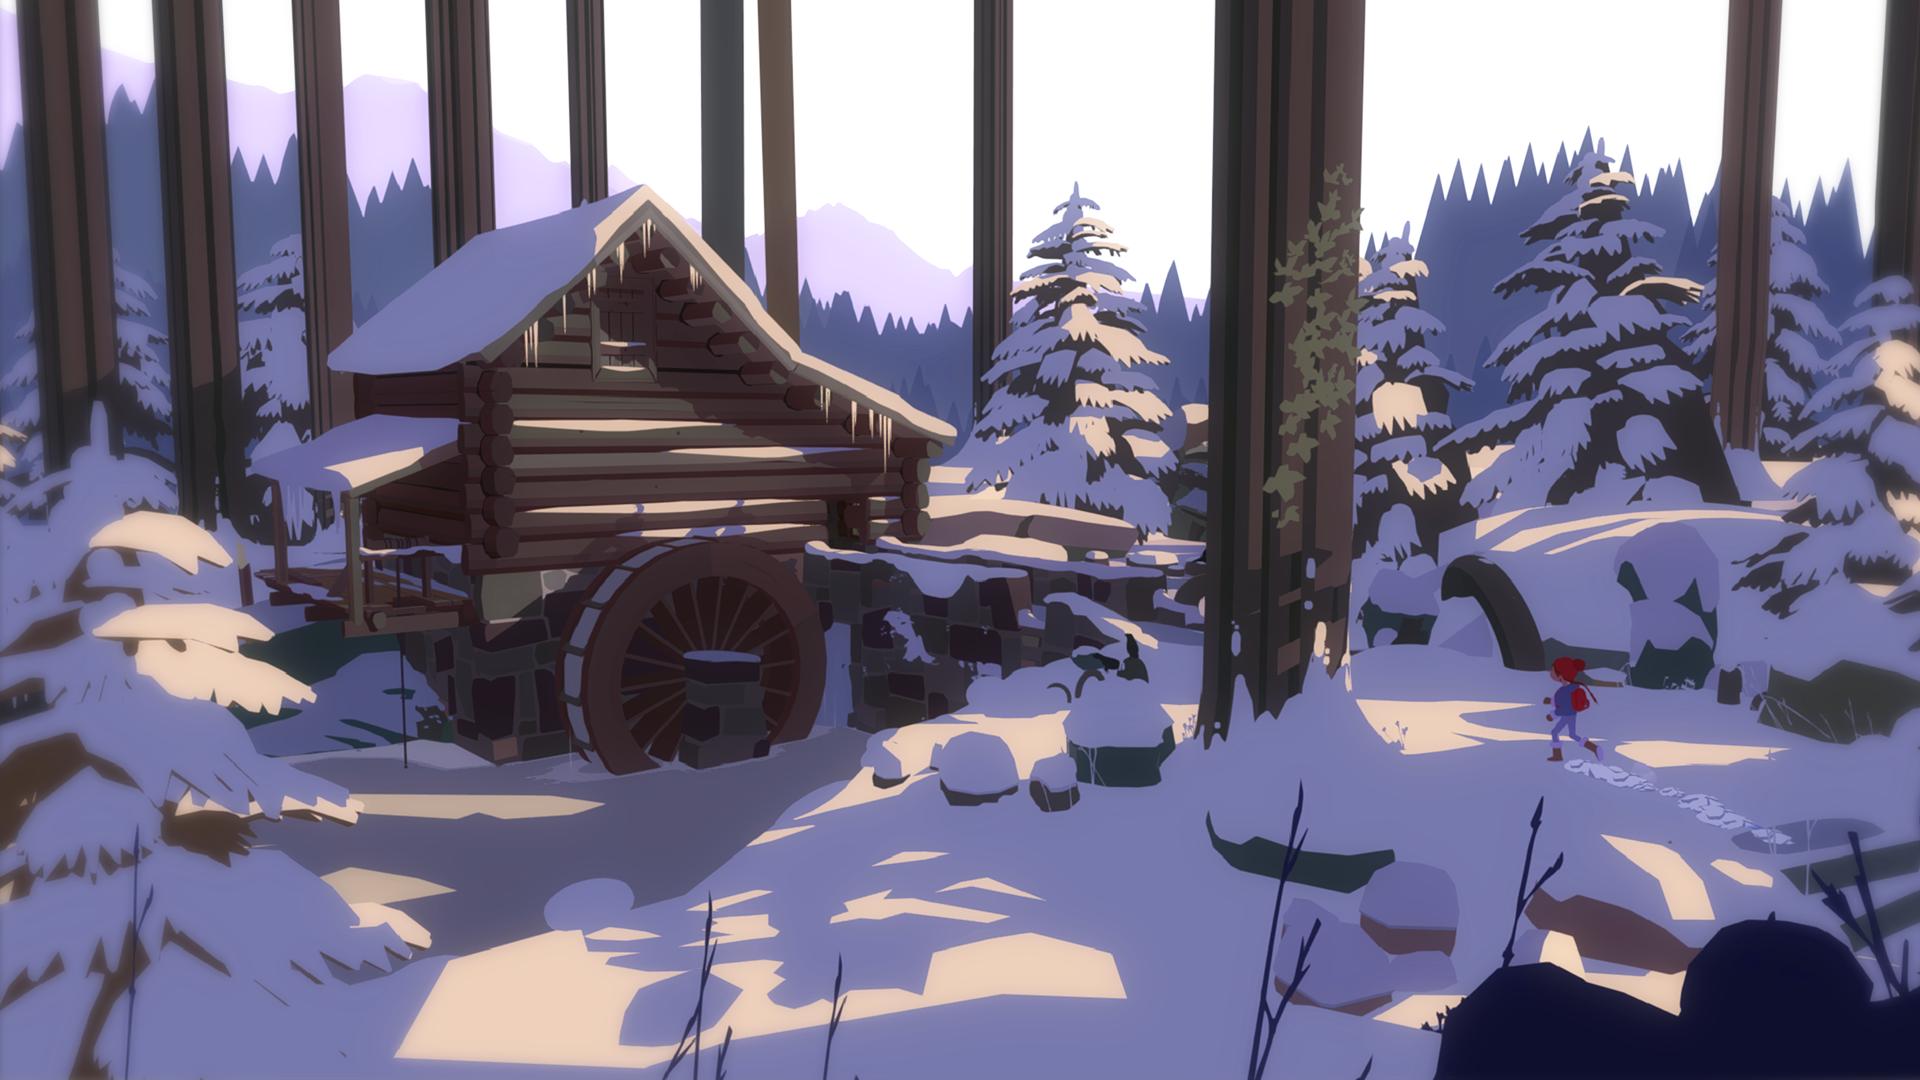 Röki is an adventure game inspired by Scandinavian folklore